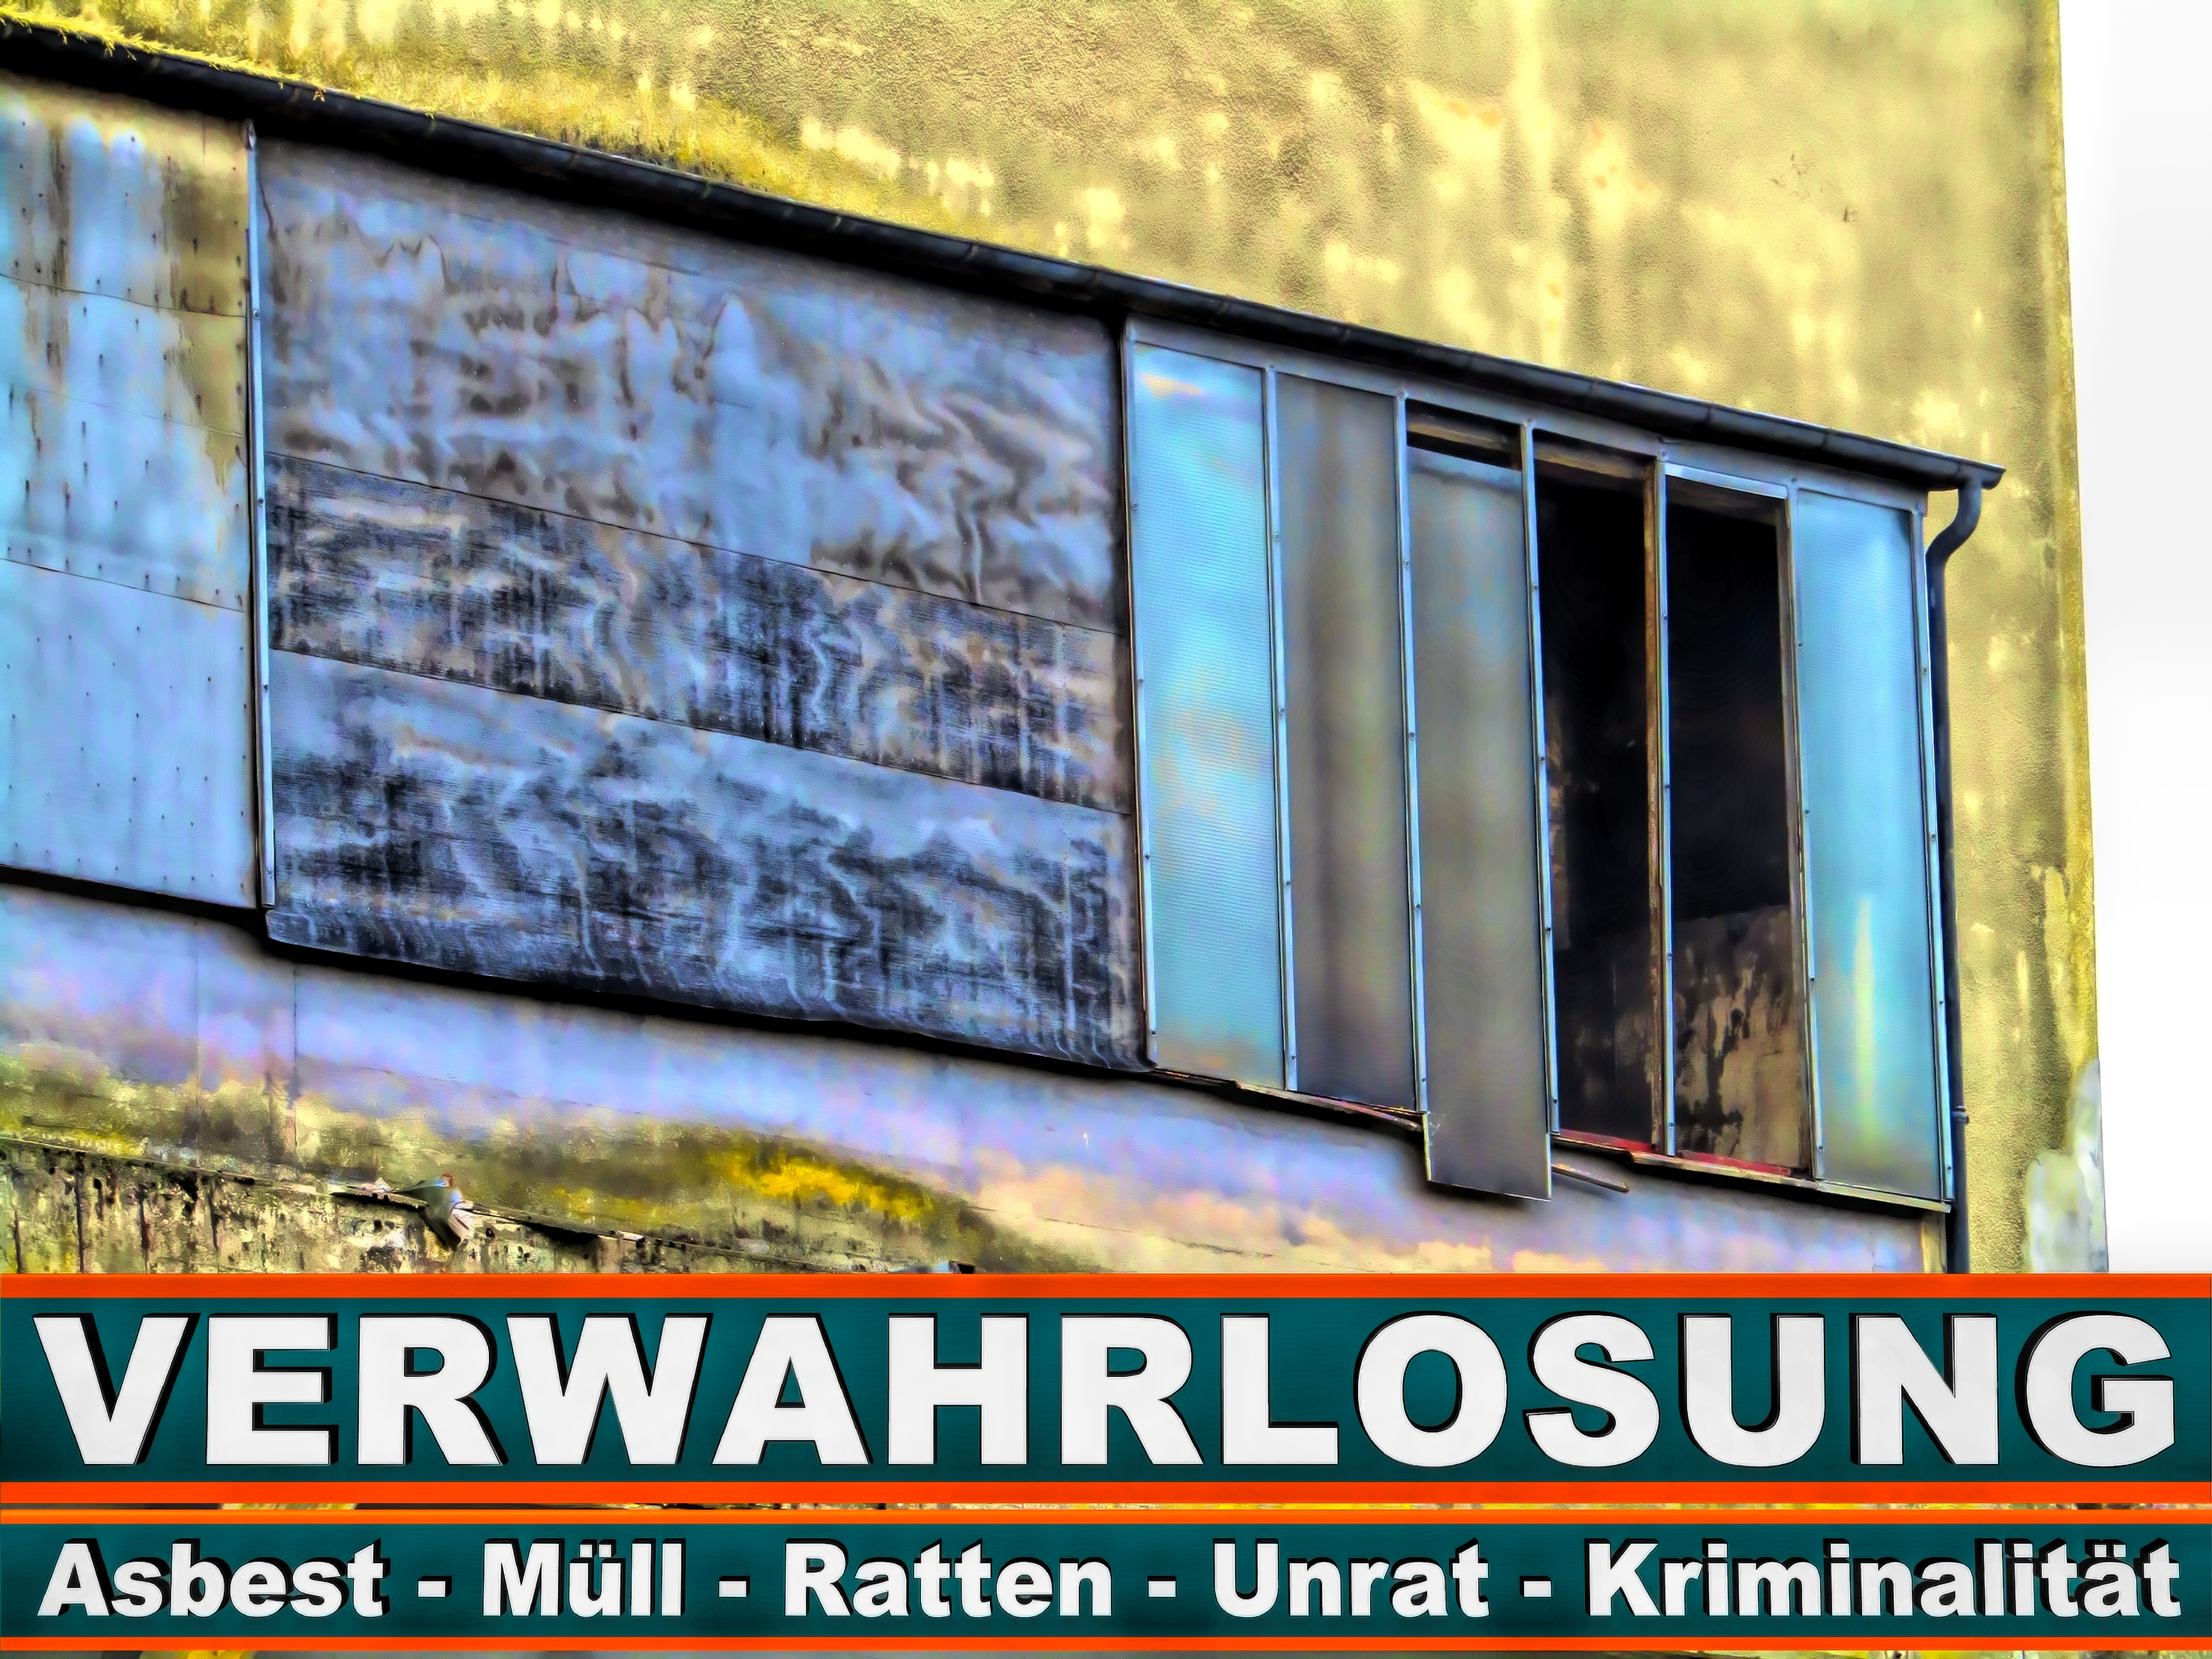 Öko Tech Park Bielefeld SEYDEL MASCHINENFABRIK GMBH Tatjana Dyherrn Krackser Str 12 041